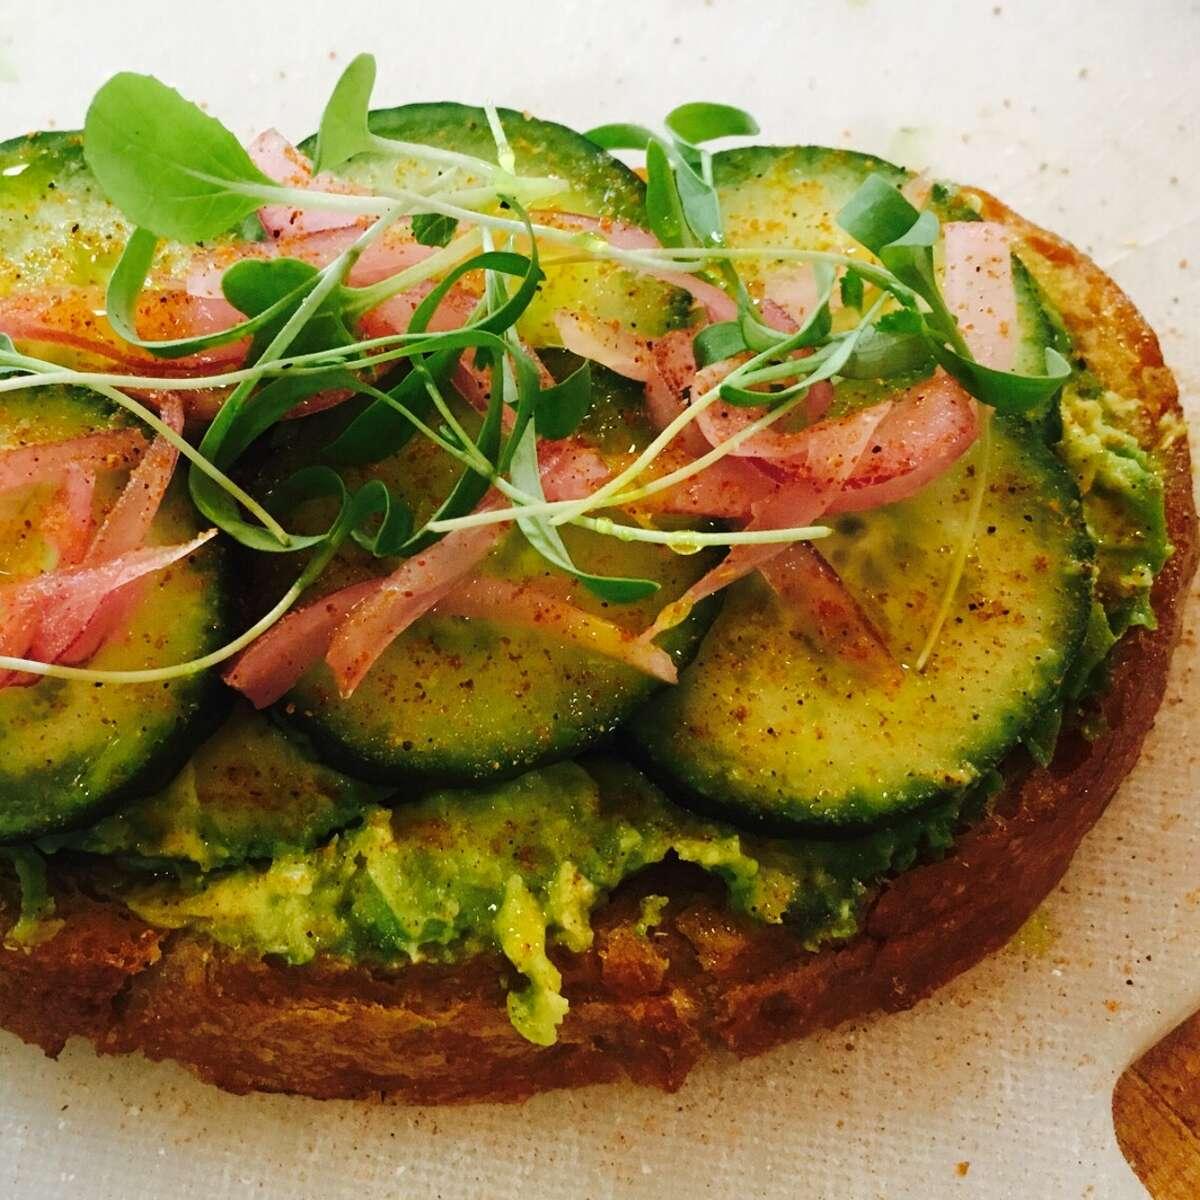 Toasty Toast ( vegan): avocado, cukes, chaat mas ala, pickled red onions